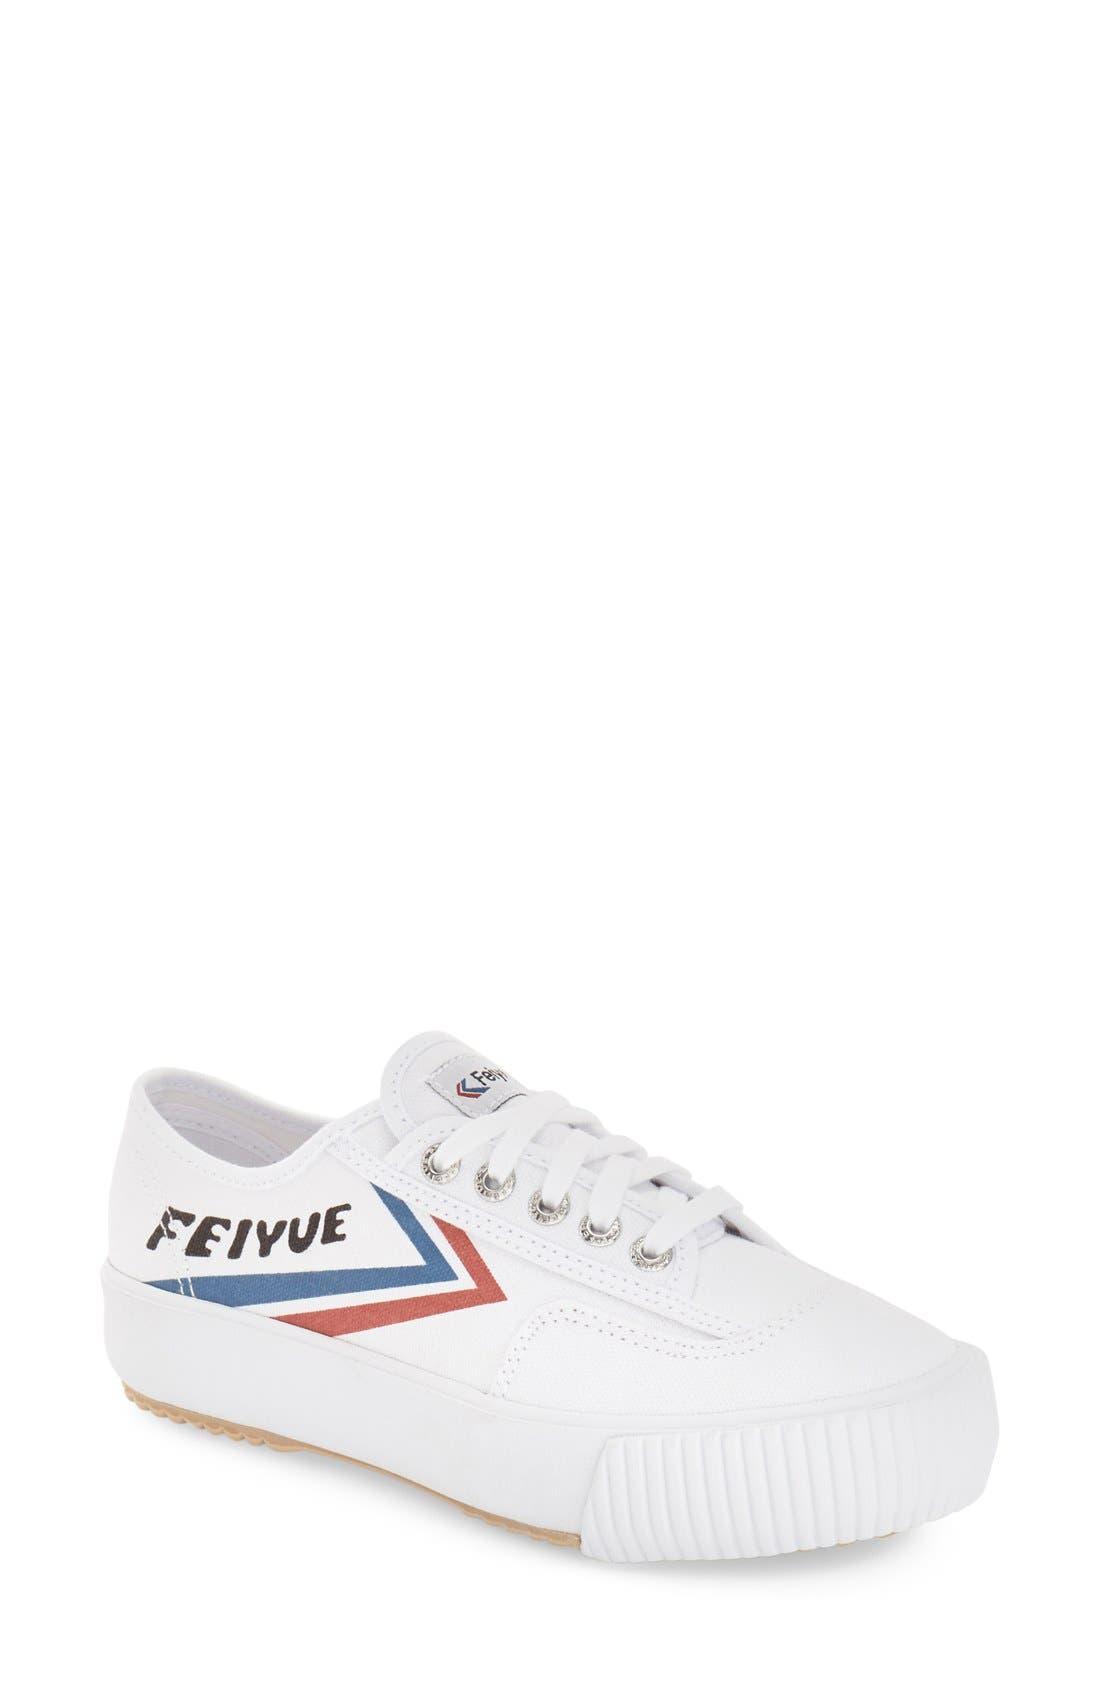 FEIYUE. 'Fe Lo Platform' Canvas Sneaker